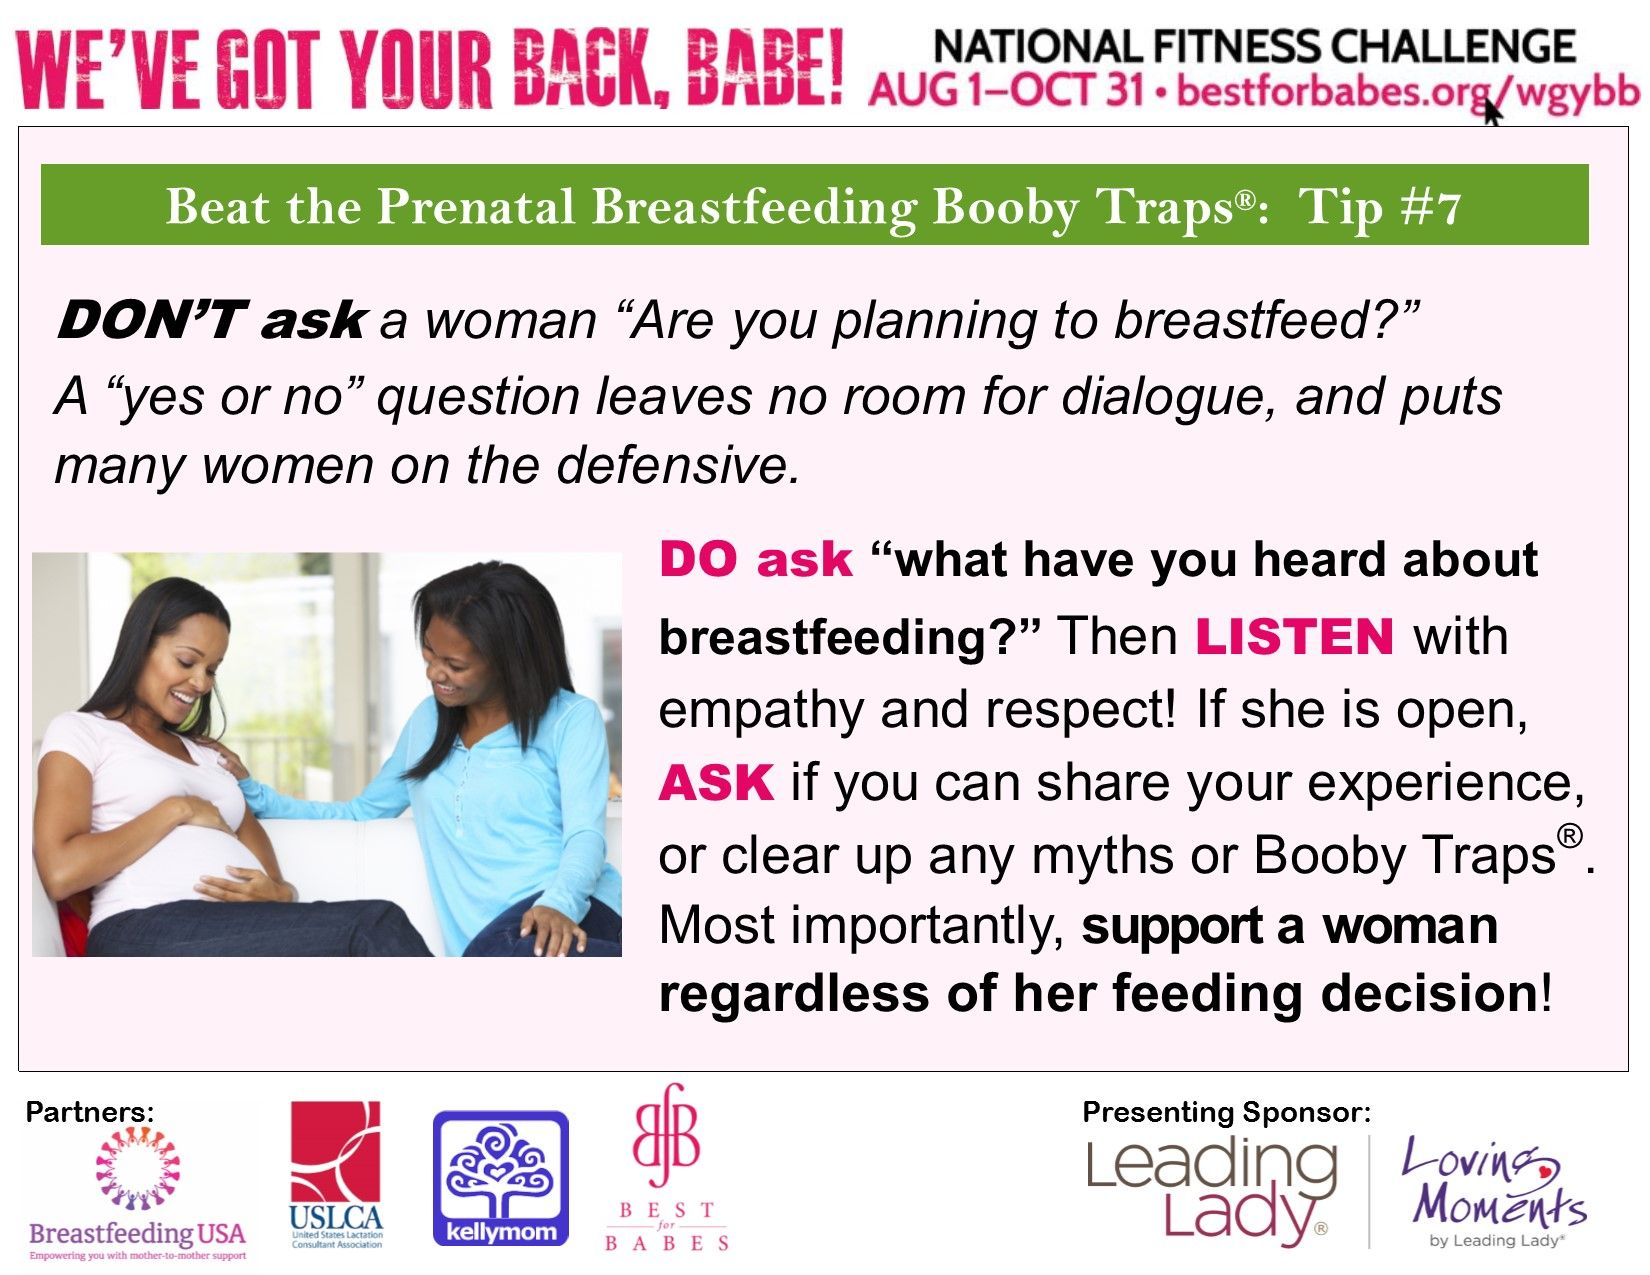 Breastfeeding: yes or no